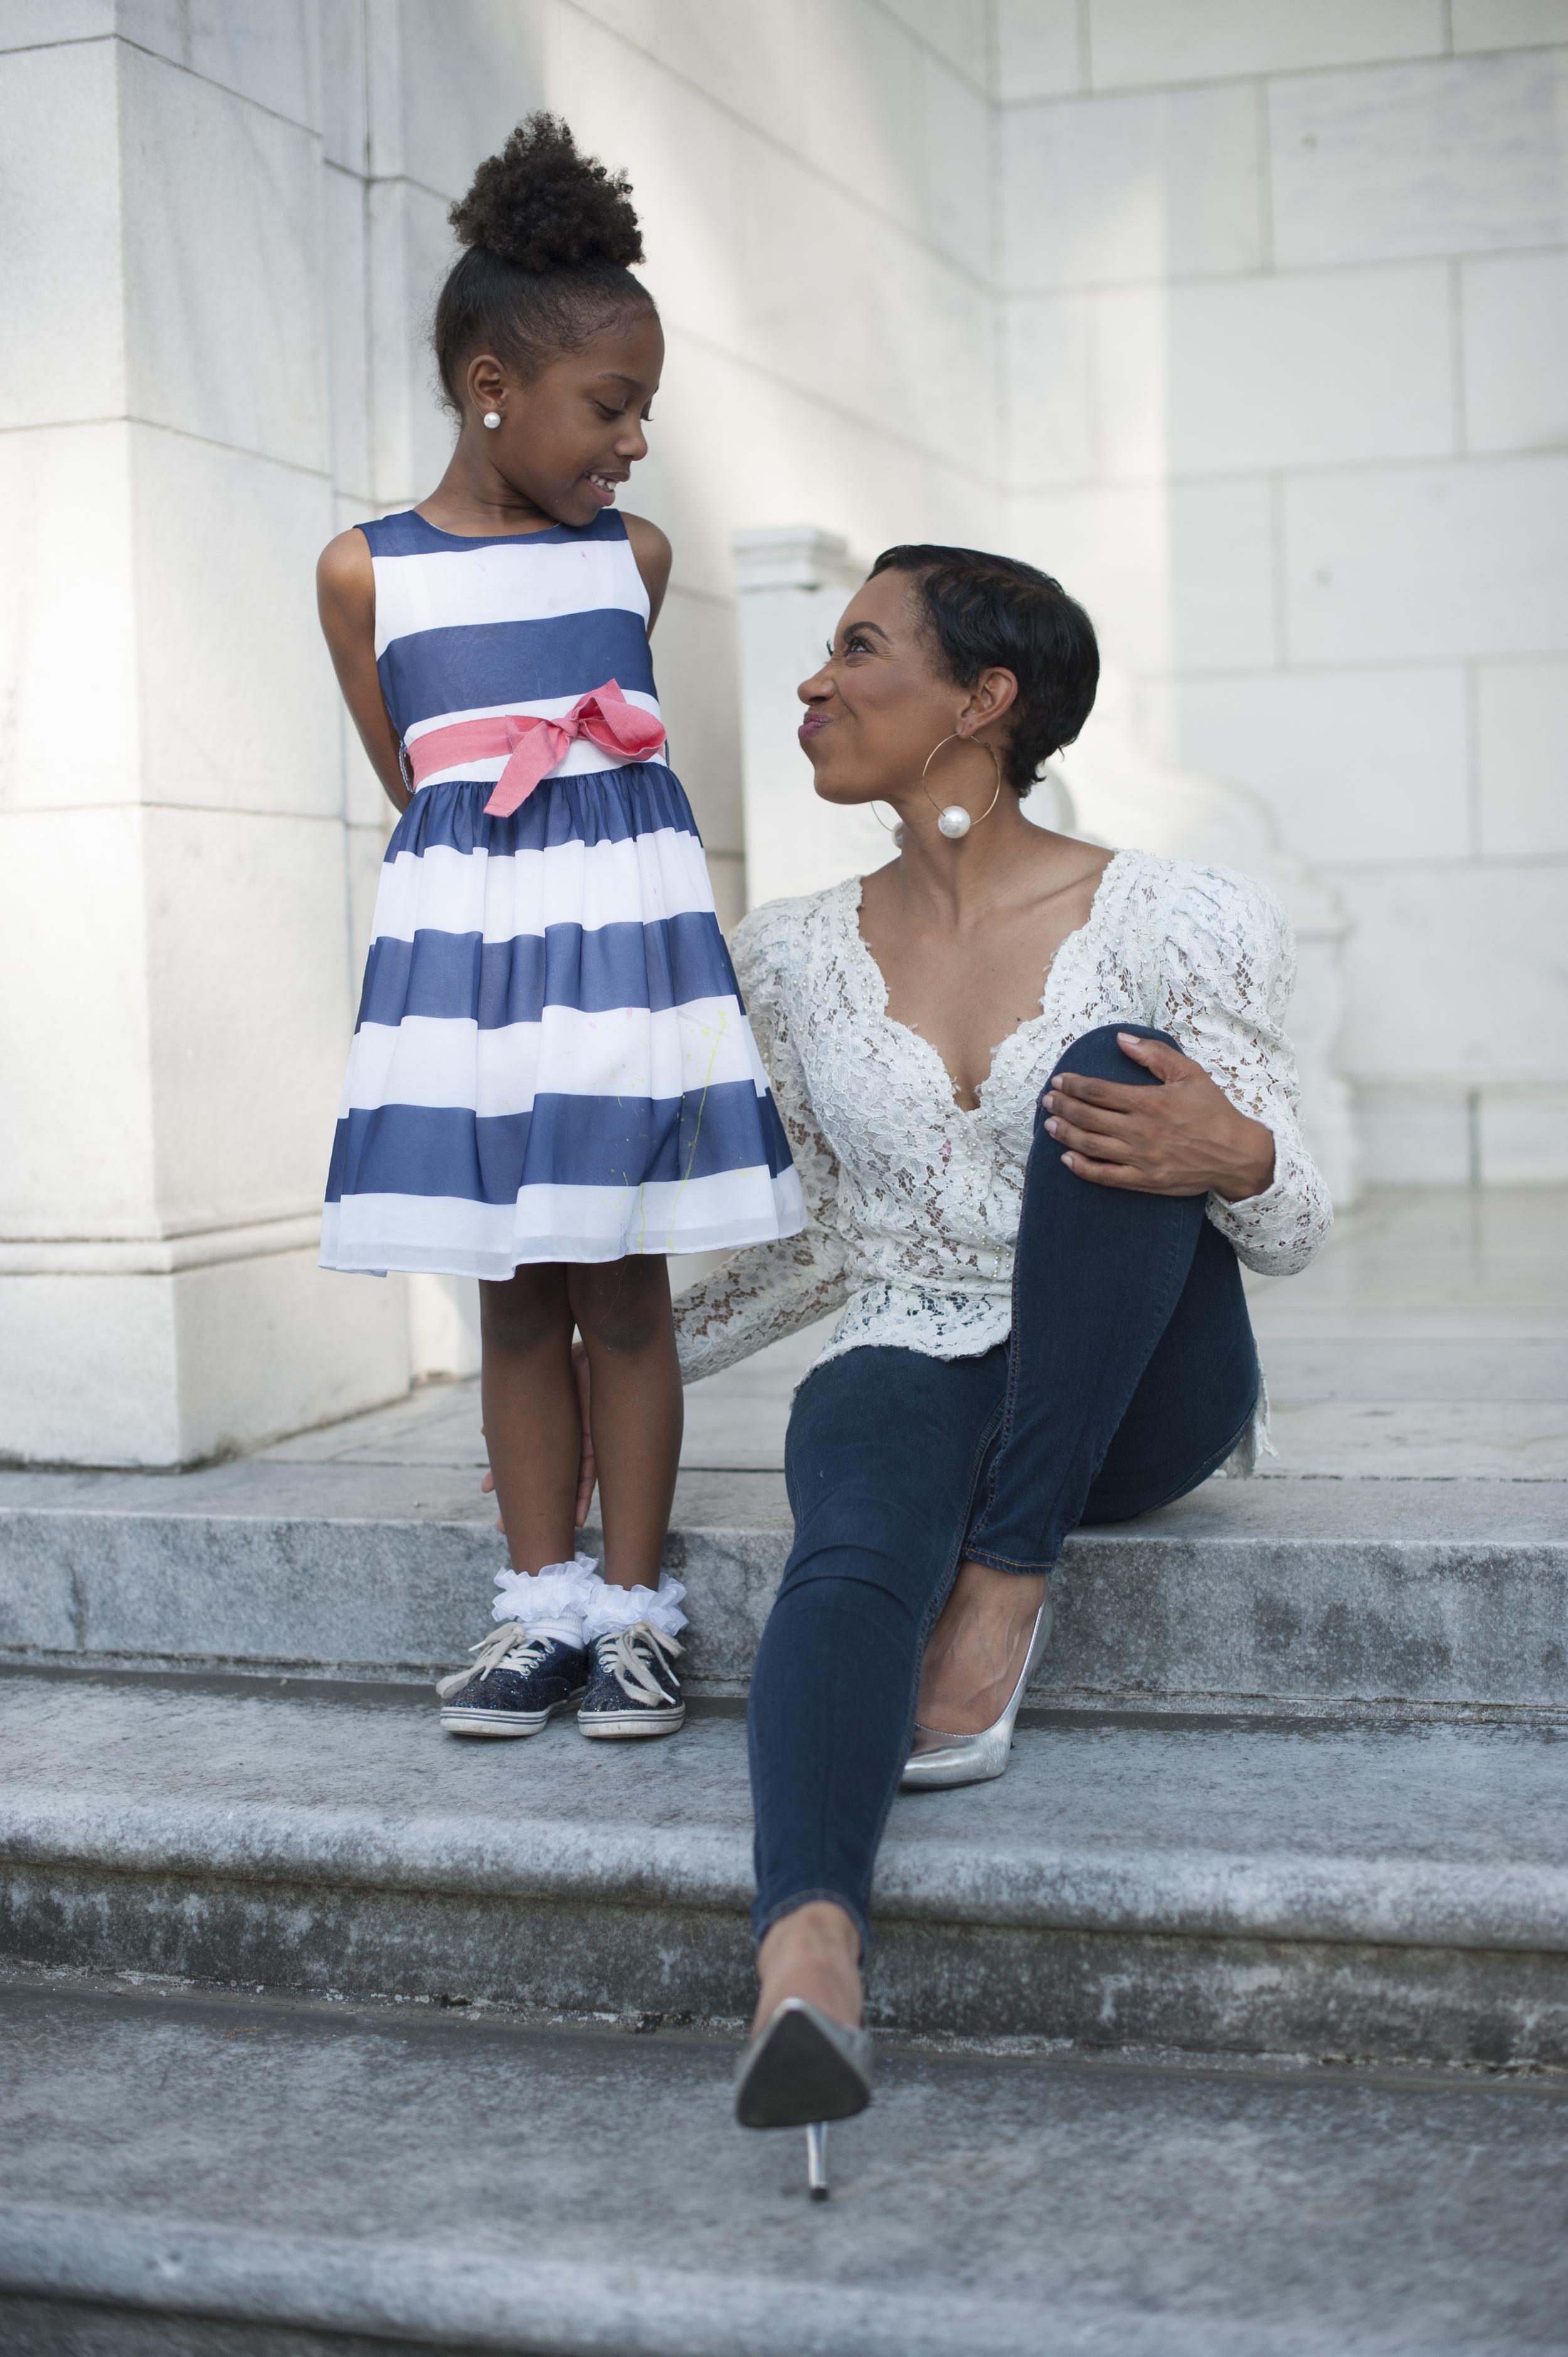 Andrea Fenise Memphis Fashion Blogger shares motherhood stories